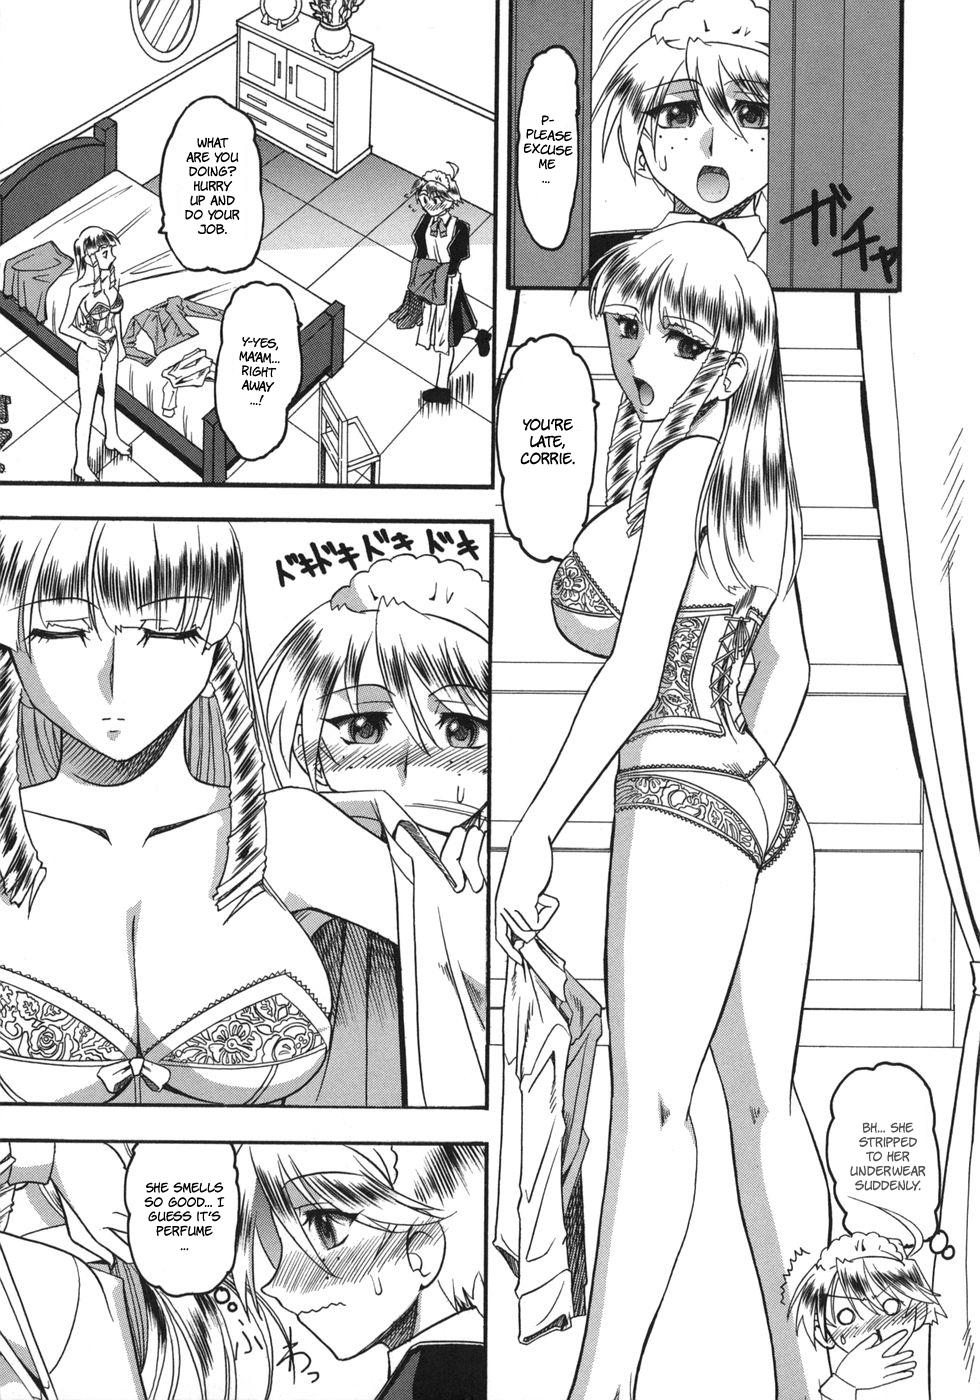 Hadaka Yori Hiwai - She is dirtier than nakedness 120